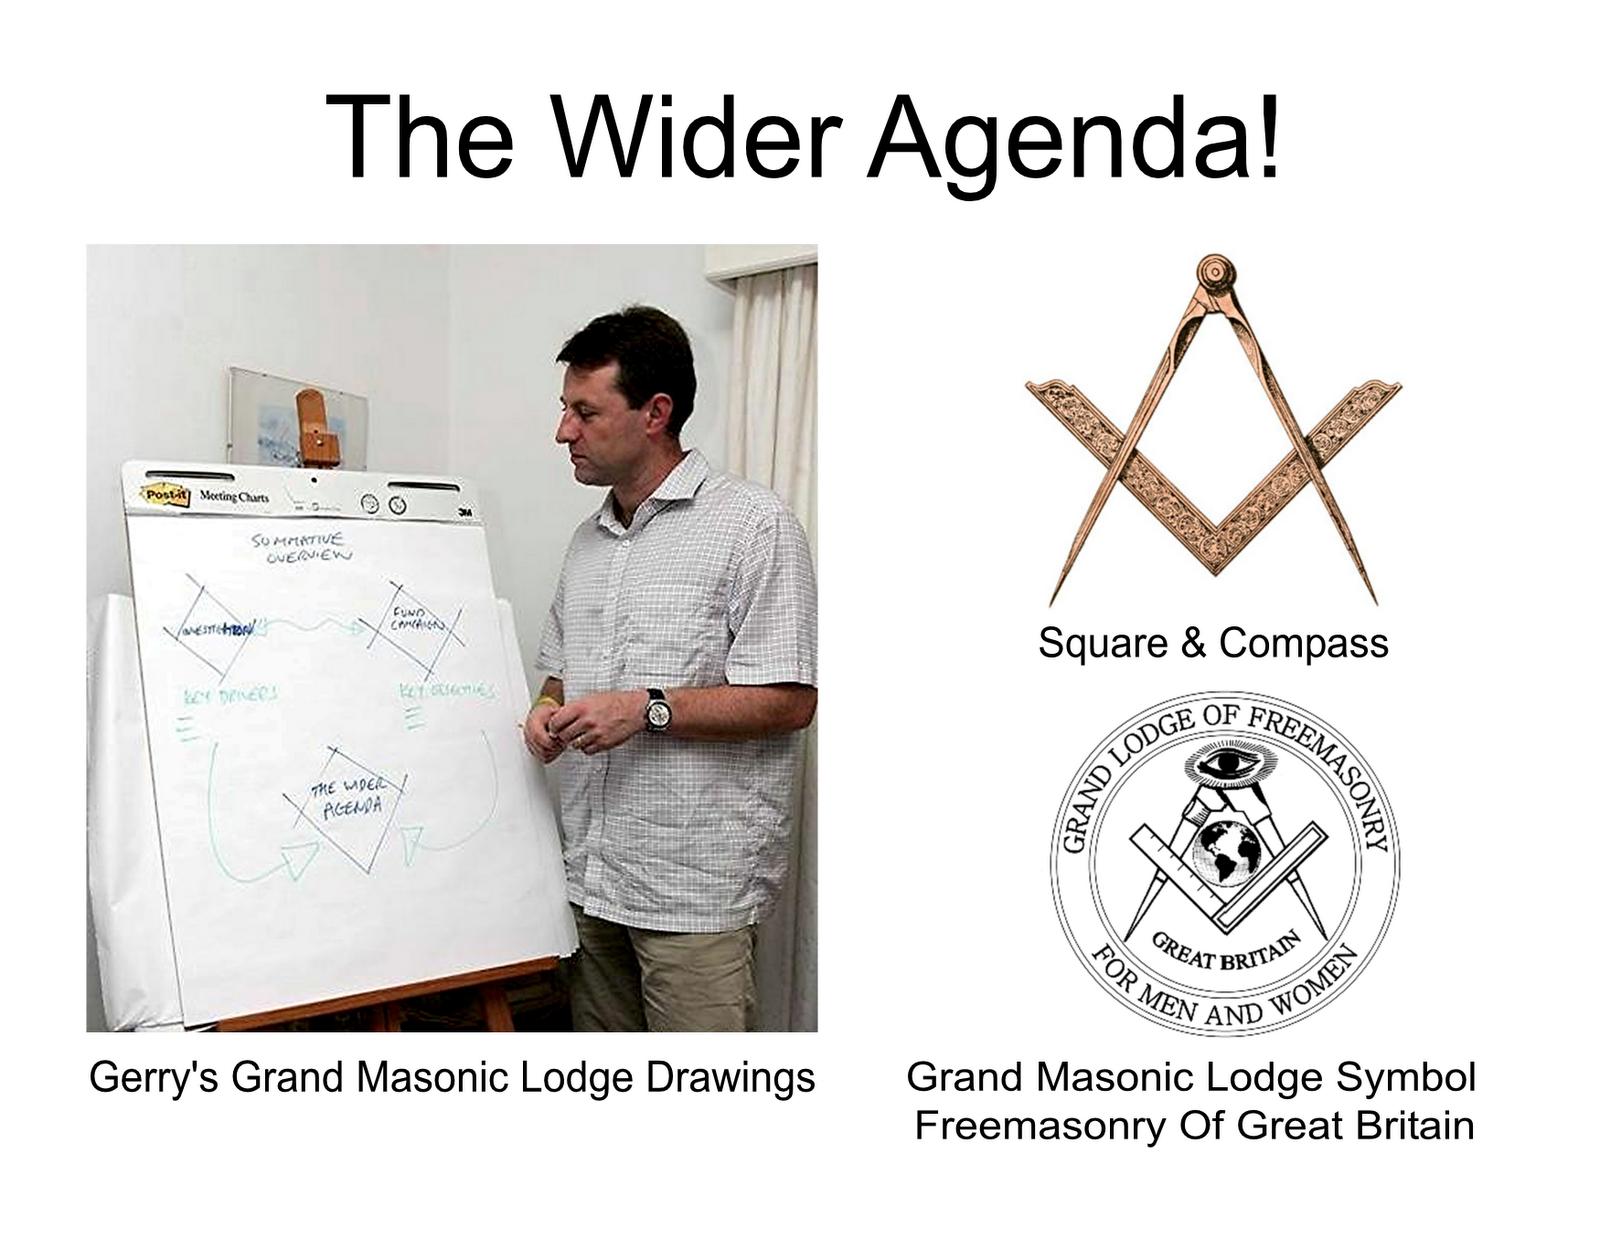 The wider agenda The%2BWider%2BAgenda